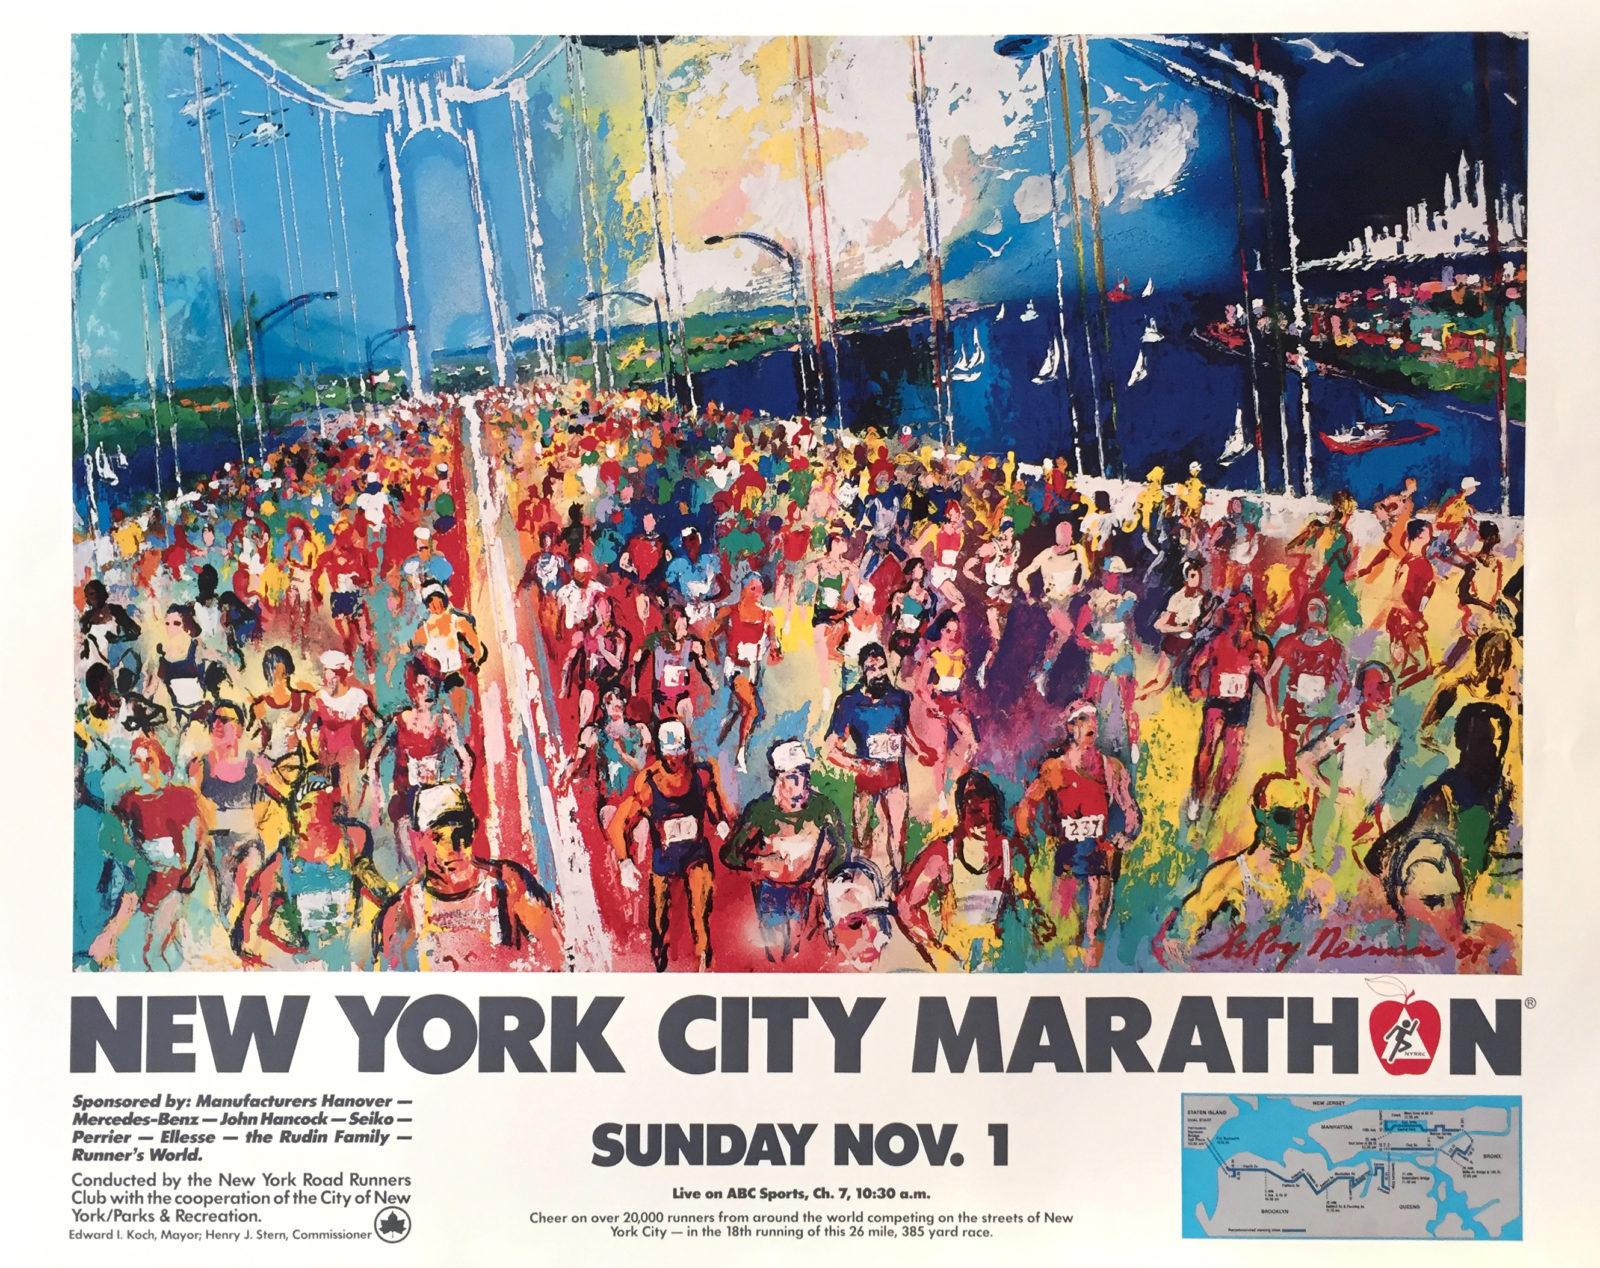 New York City Marathon 1987 poster